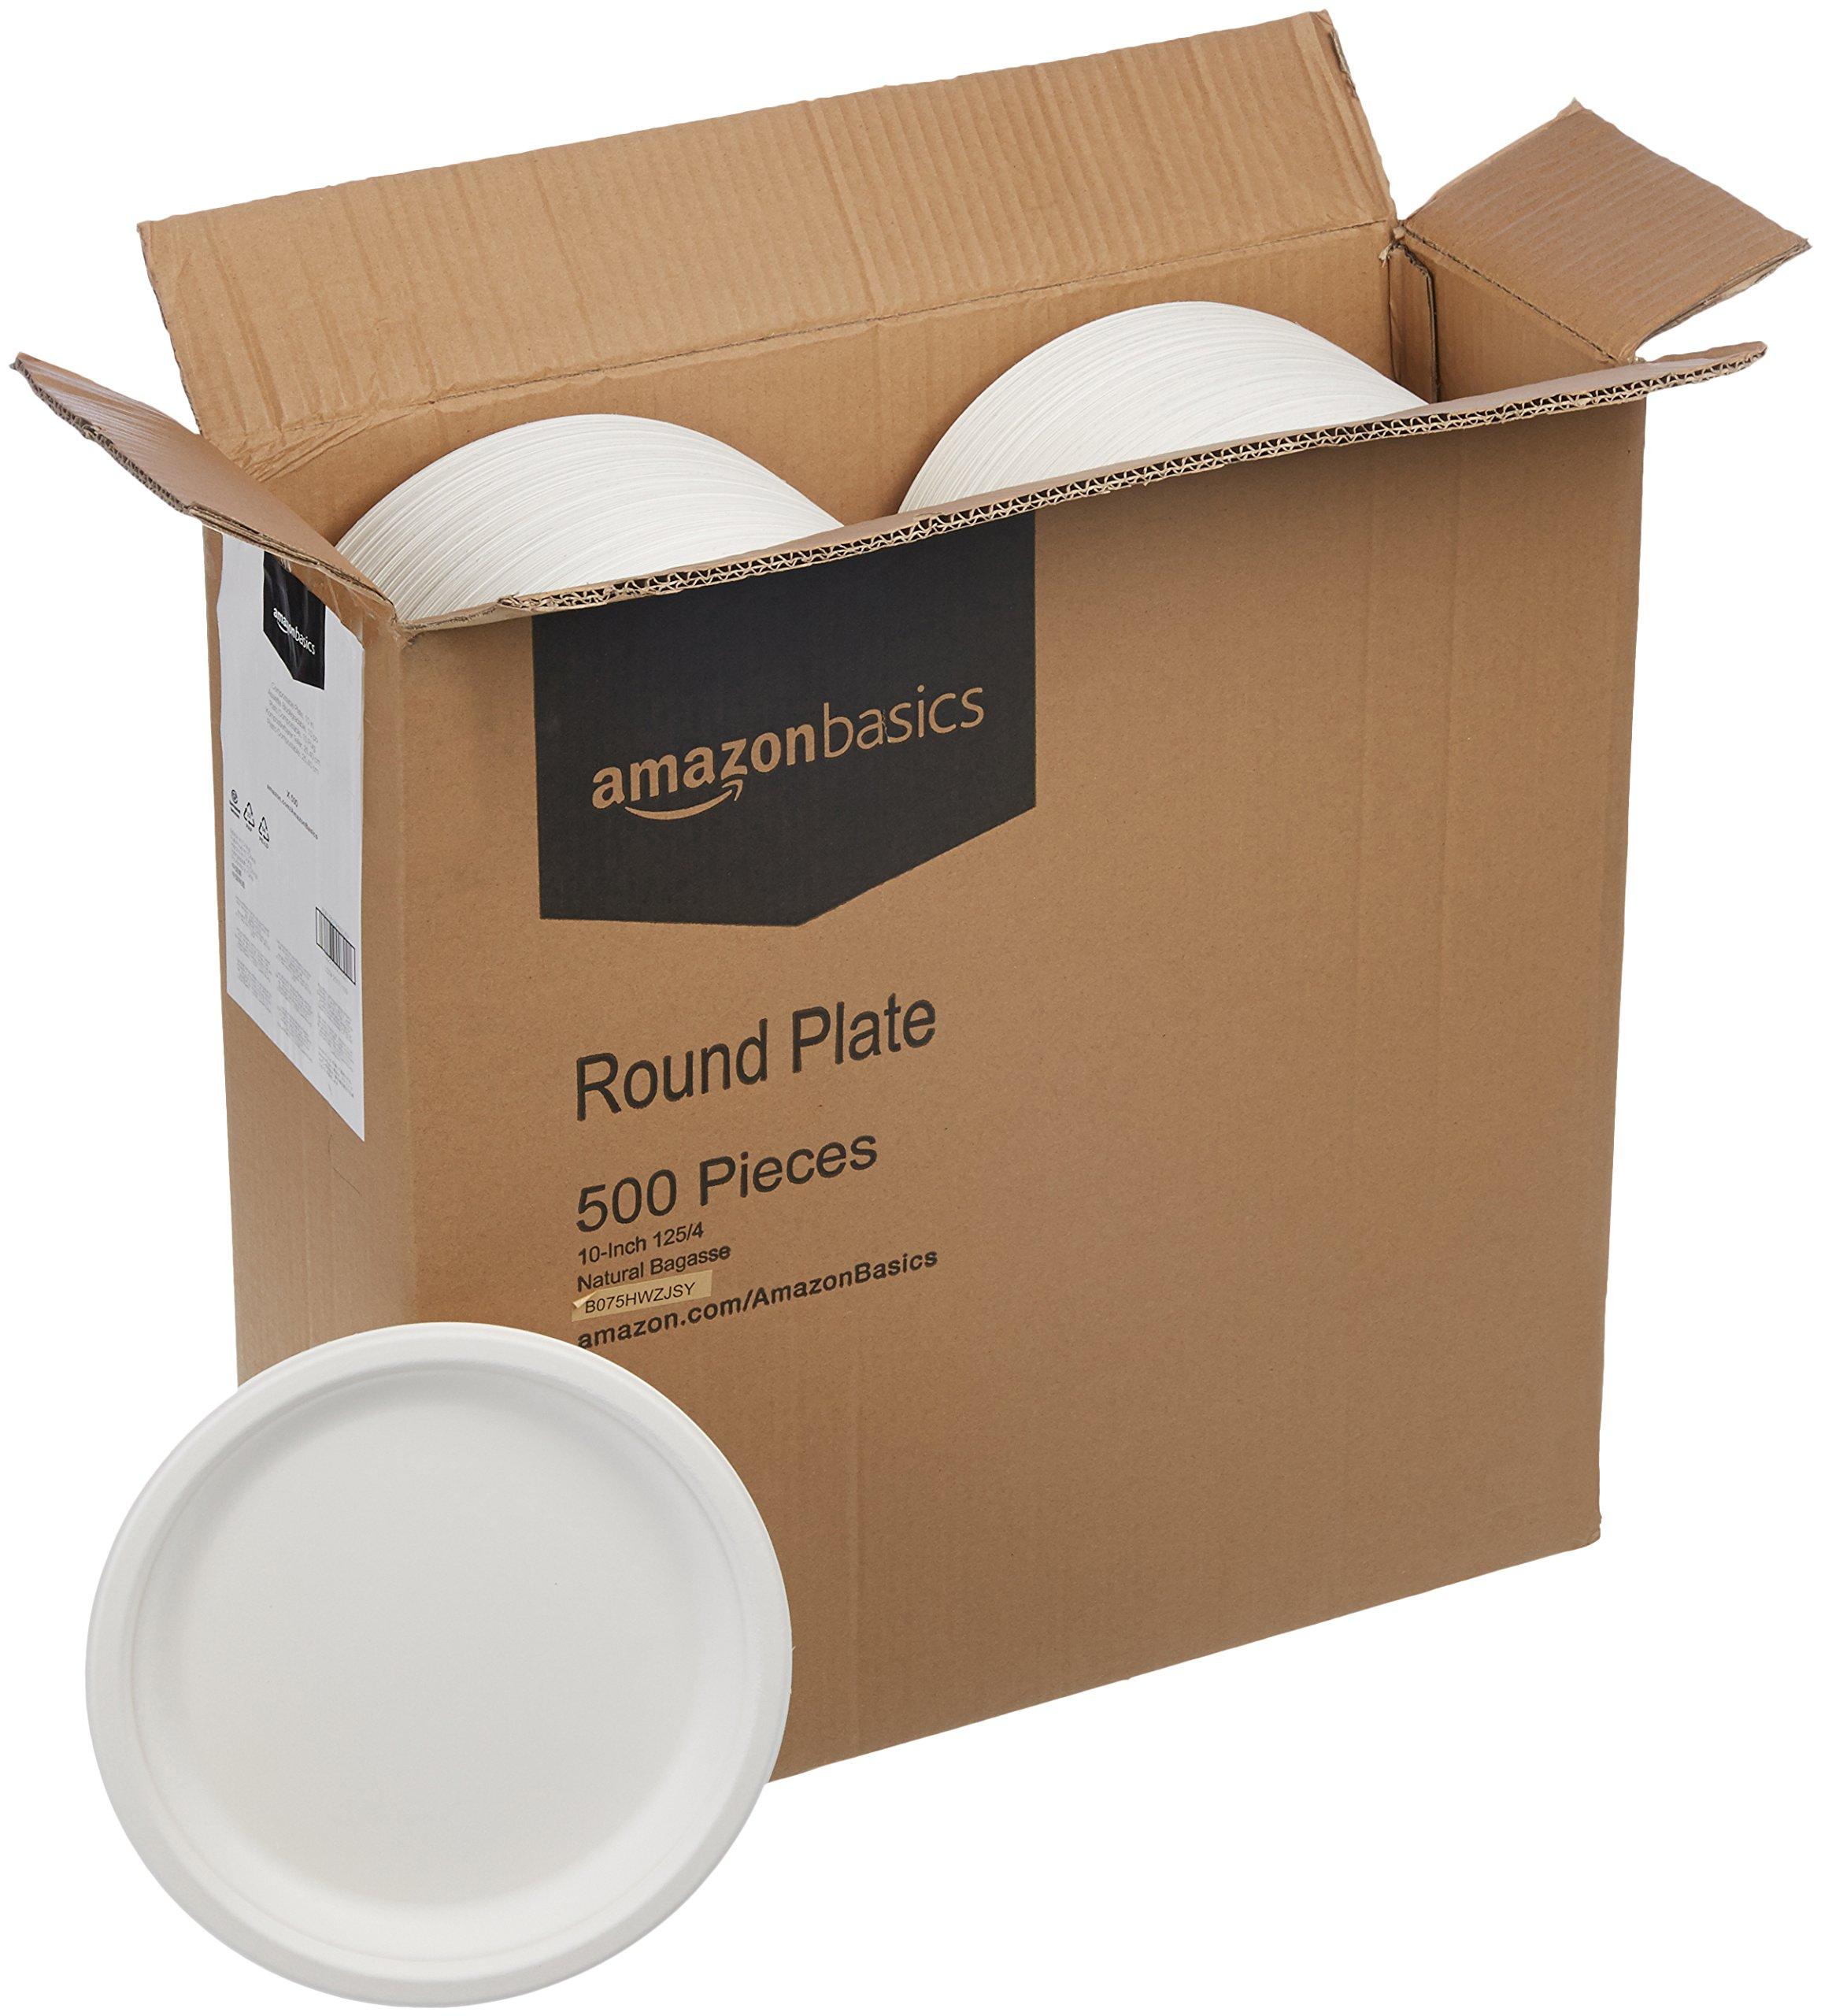 AmazonBasics 10-Inch Compostable Plates, 500-Count by AmazonBasics (Image #3)